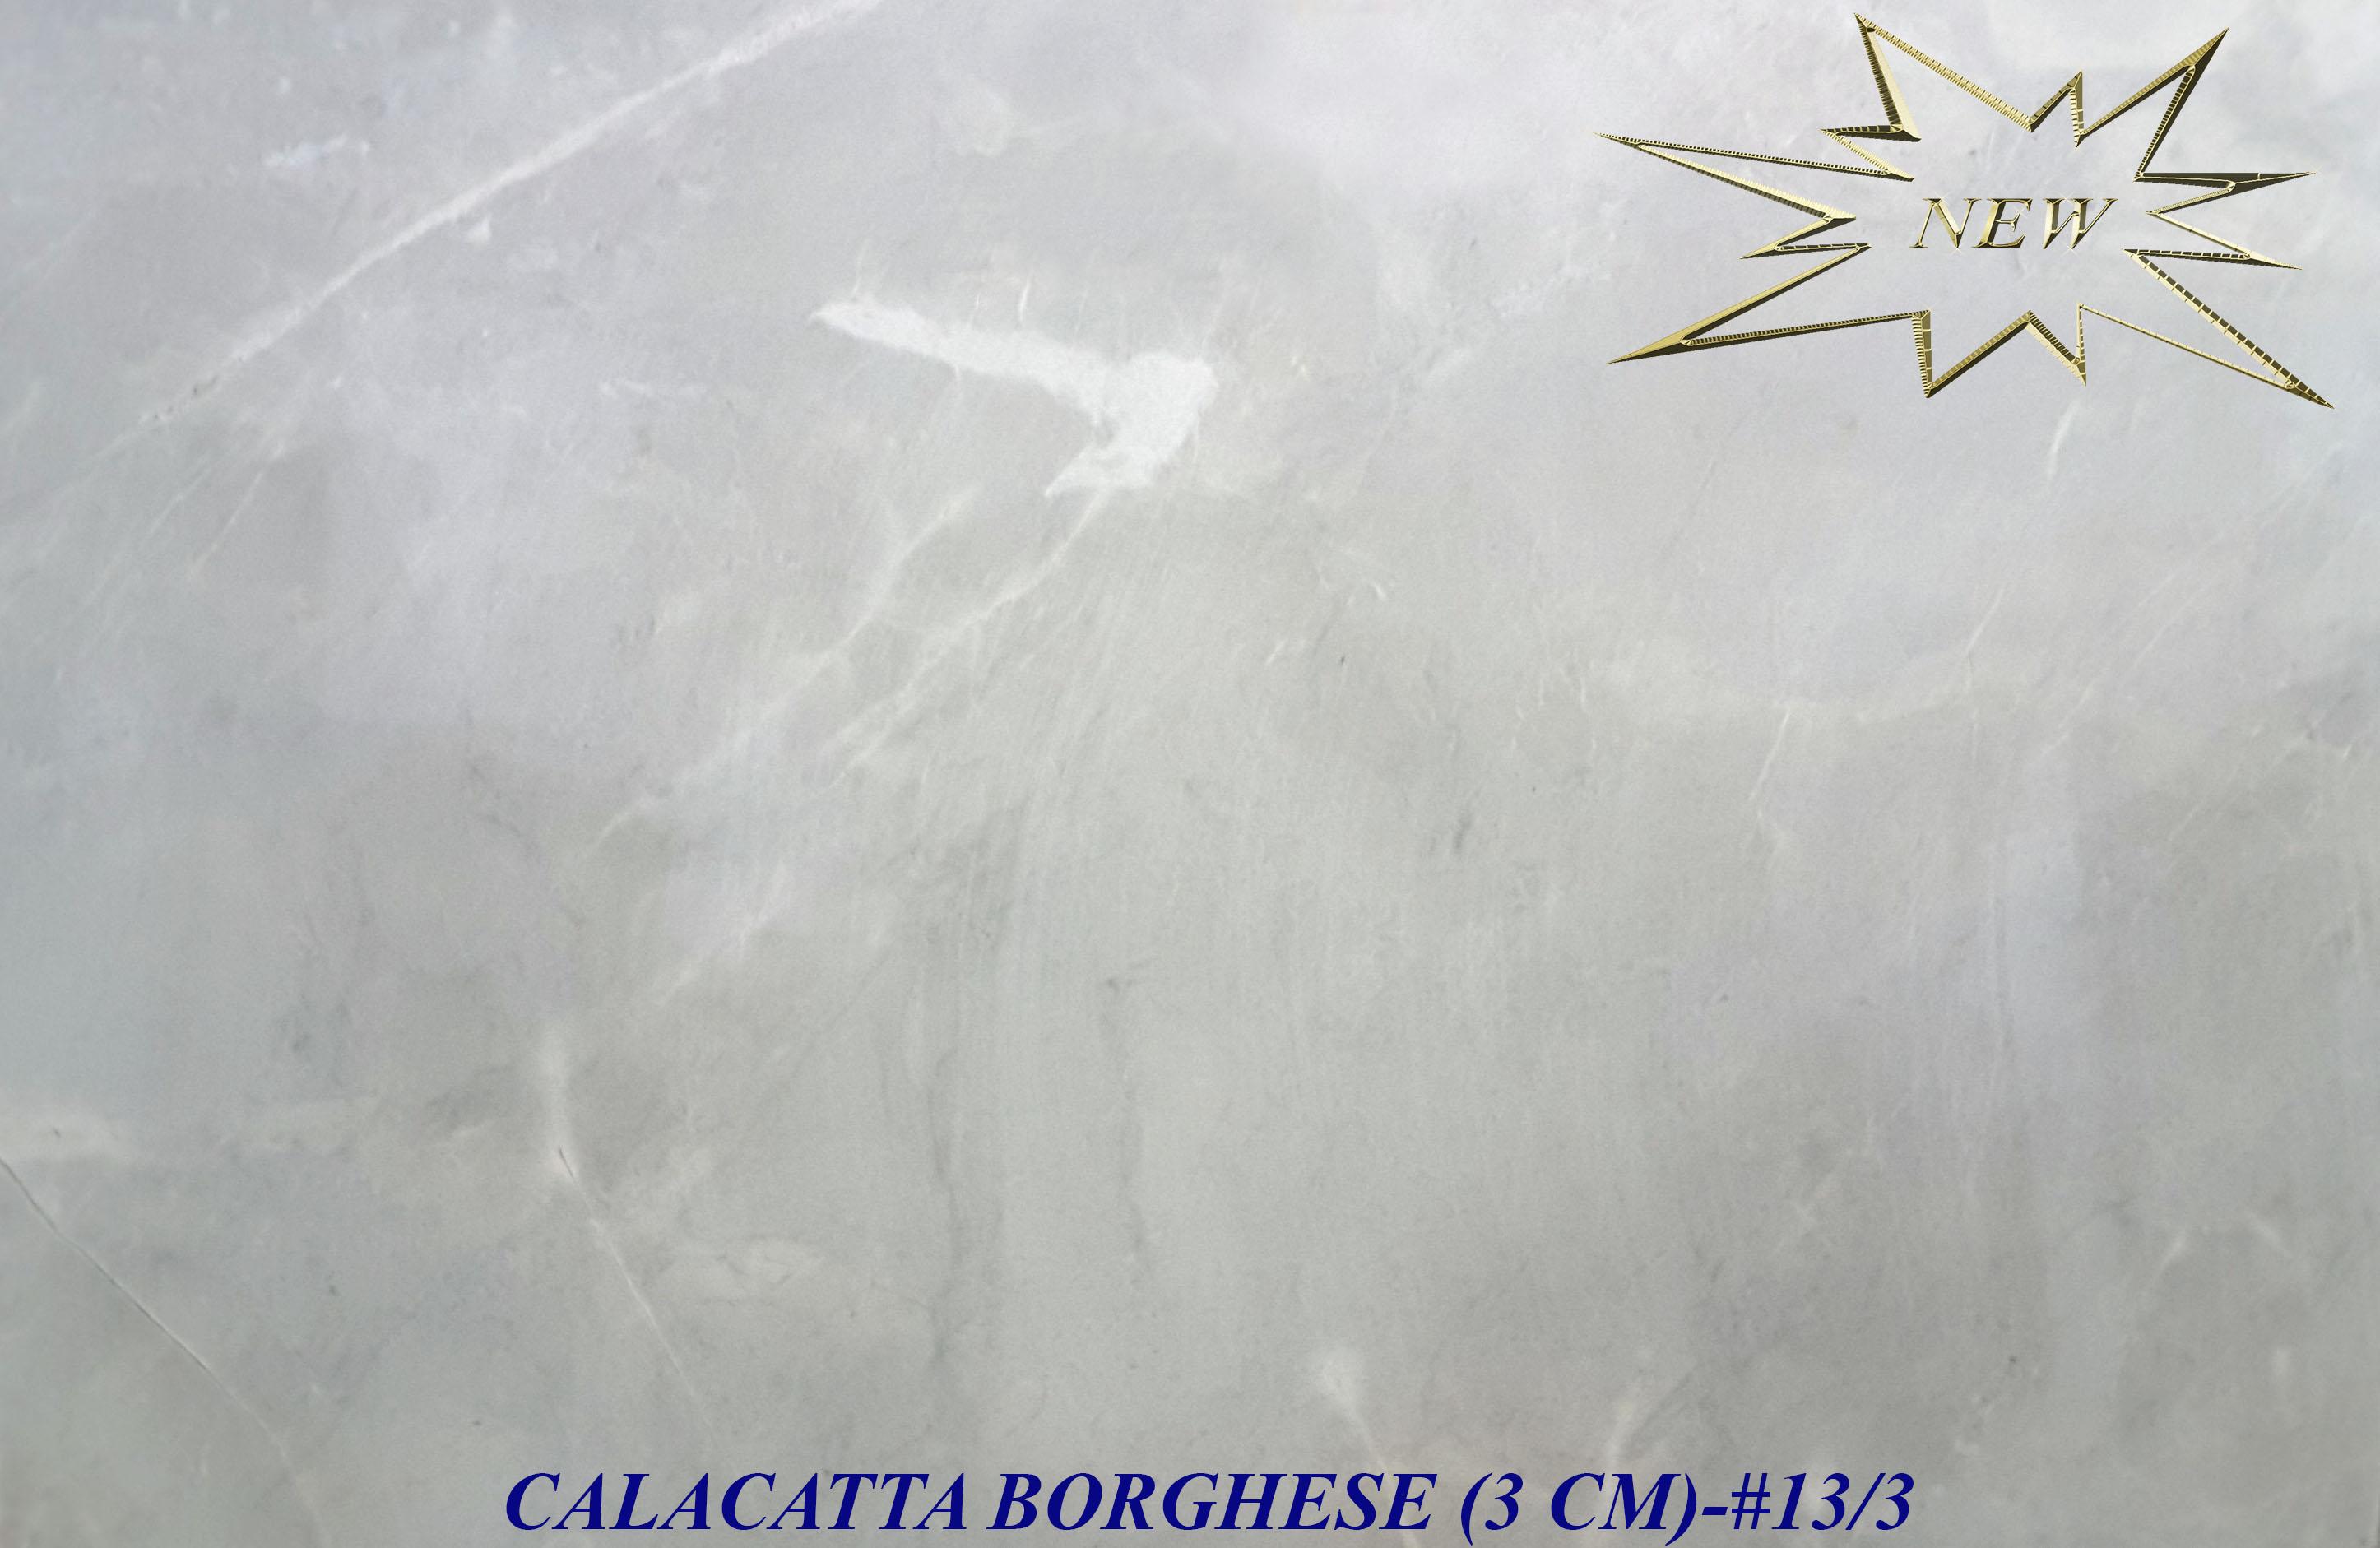 CALACATTA BORGHESE 3CM-#13-3-STAR